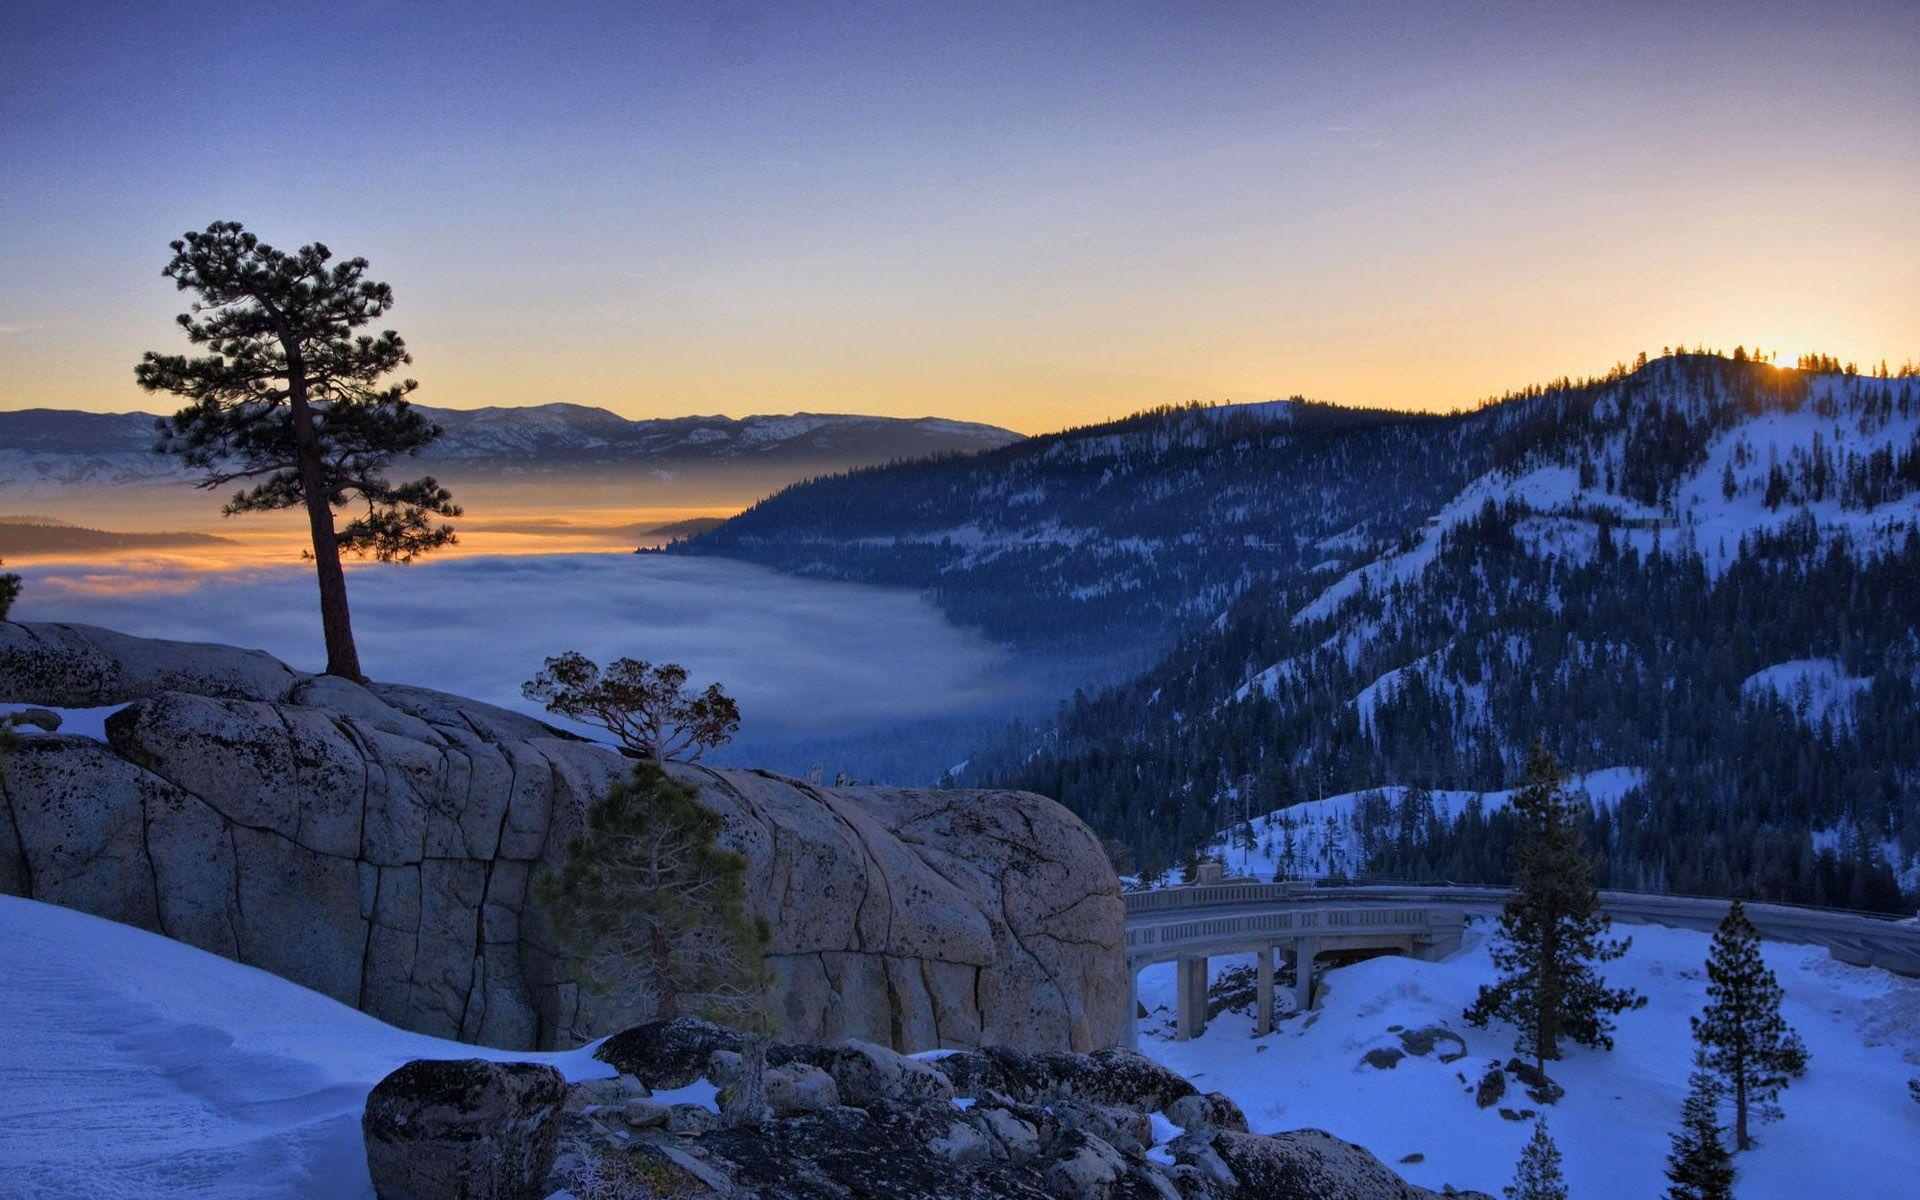 scenic winter beautiful wallpapers - photo #8